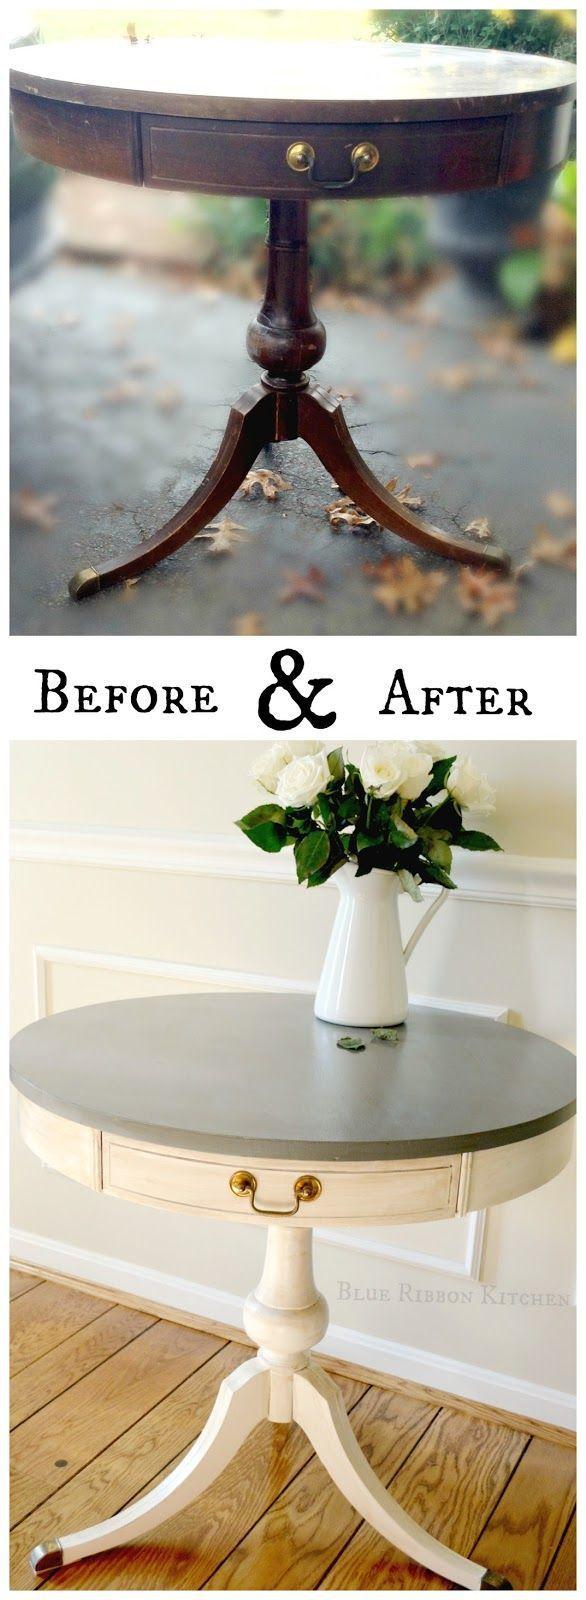 Diy Crafts Ideas Blue Ribbon Kitchen Creamy White by